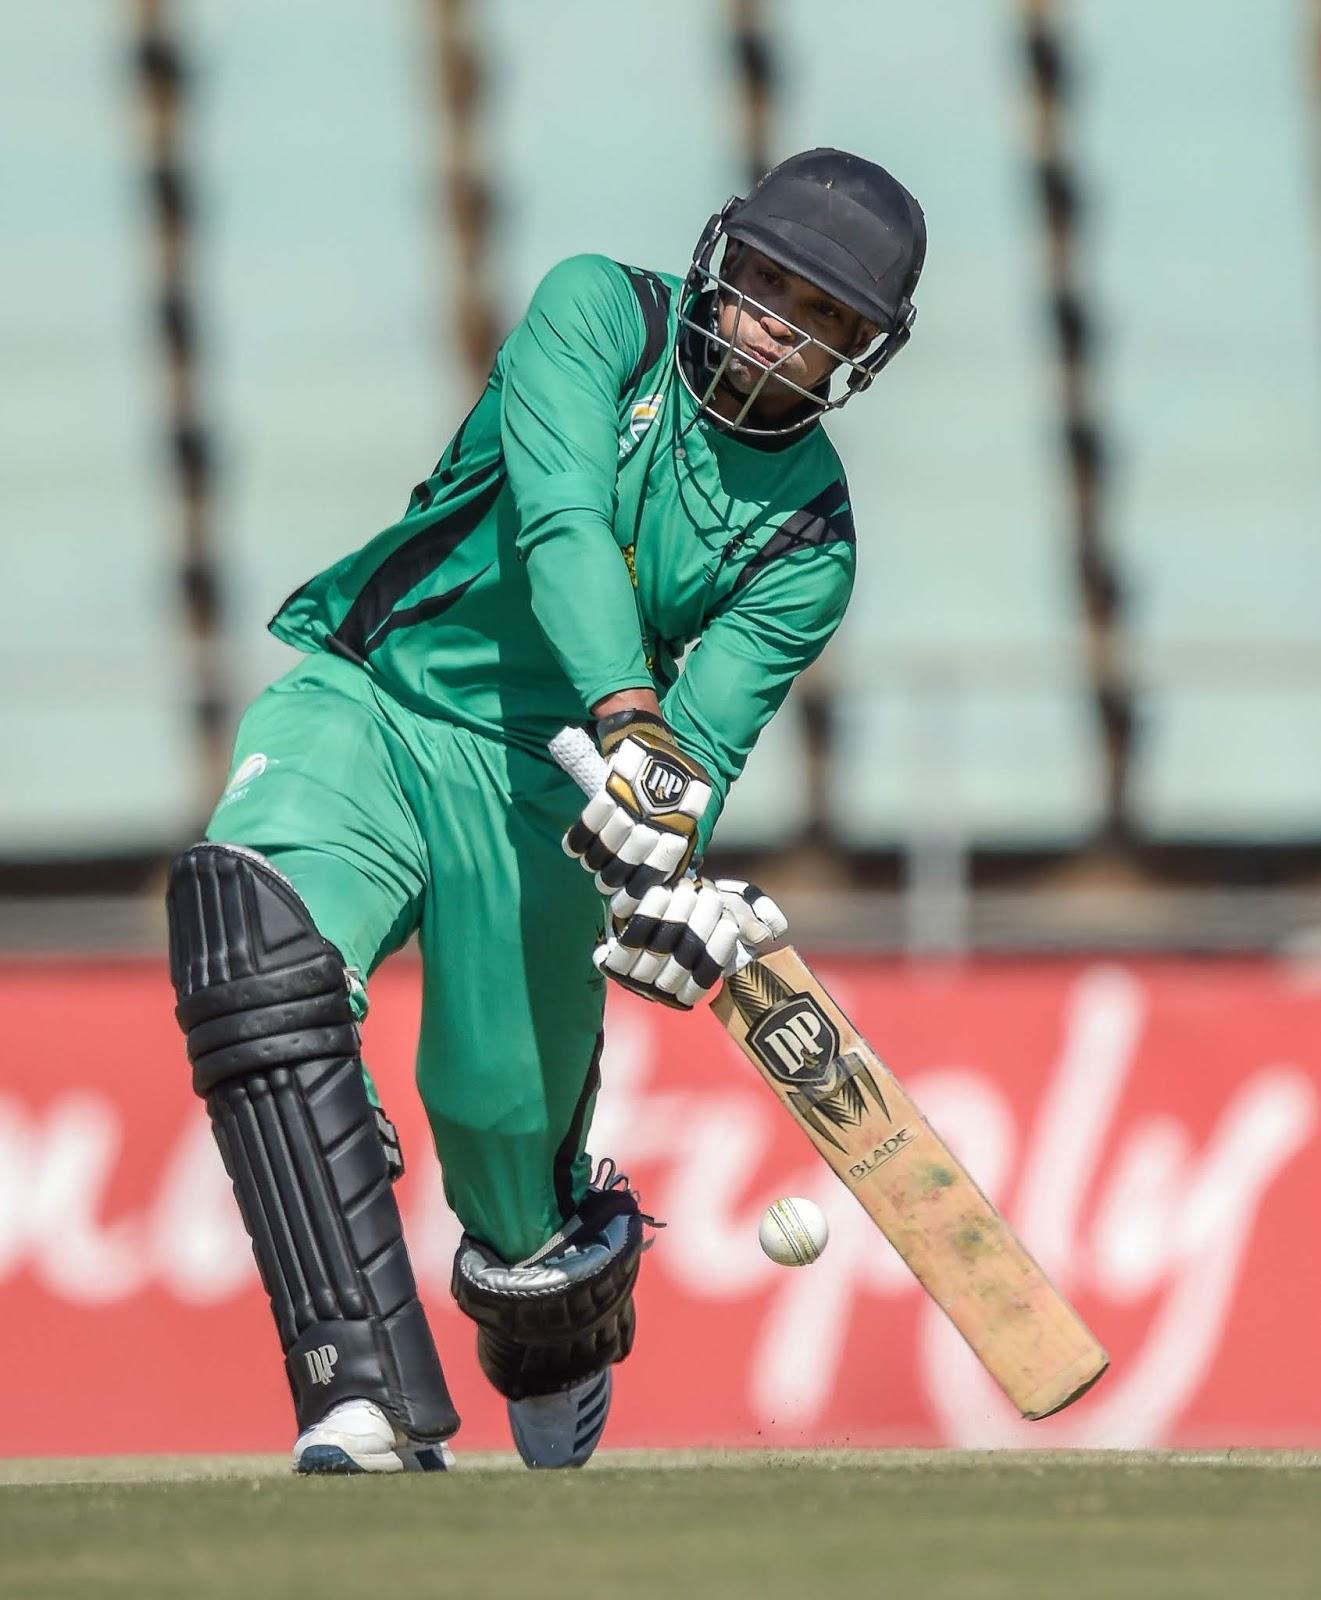 Michael Erlank batting for Hollywoodbets KZN Coastal - Cricket